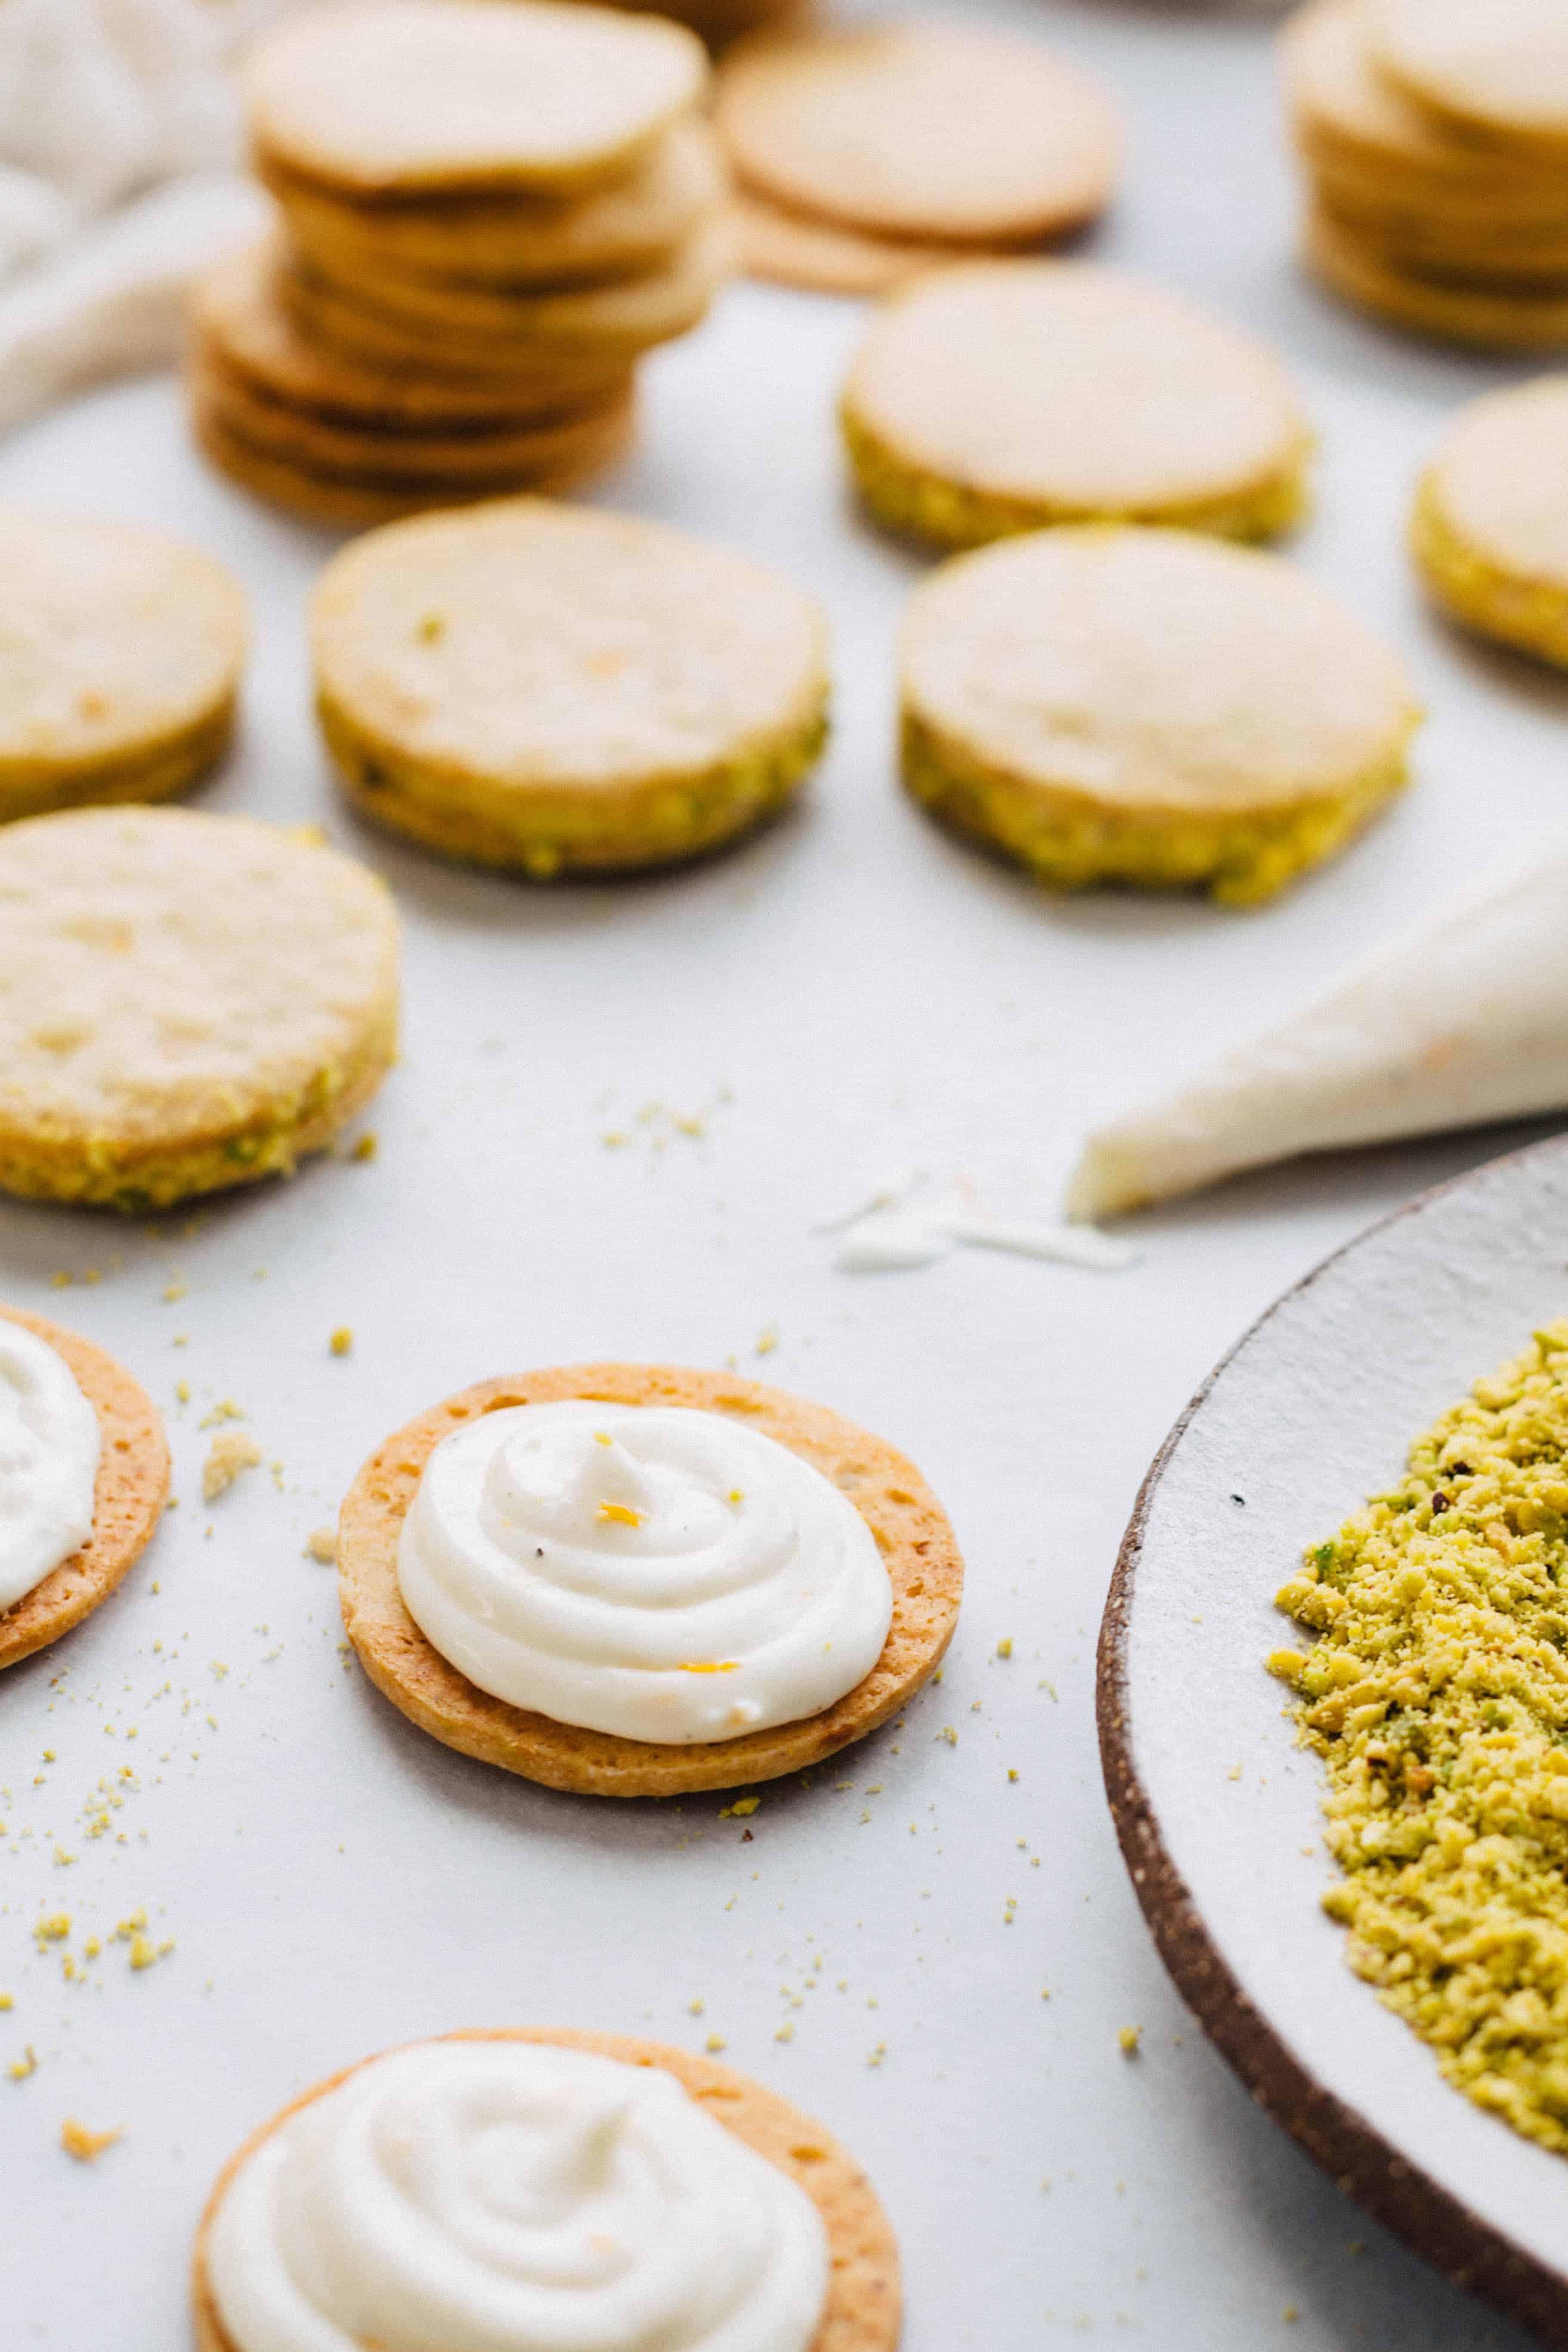 A pastry bag adding filling to a lemon pistachio cookie half.